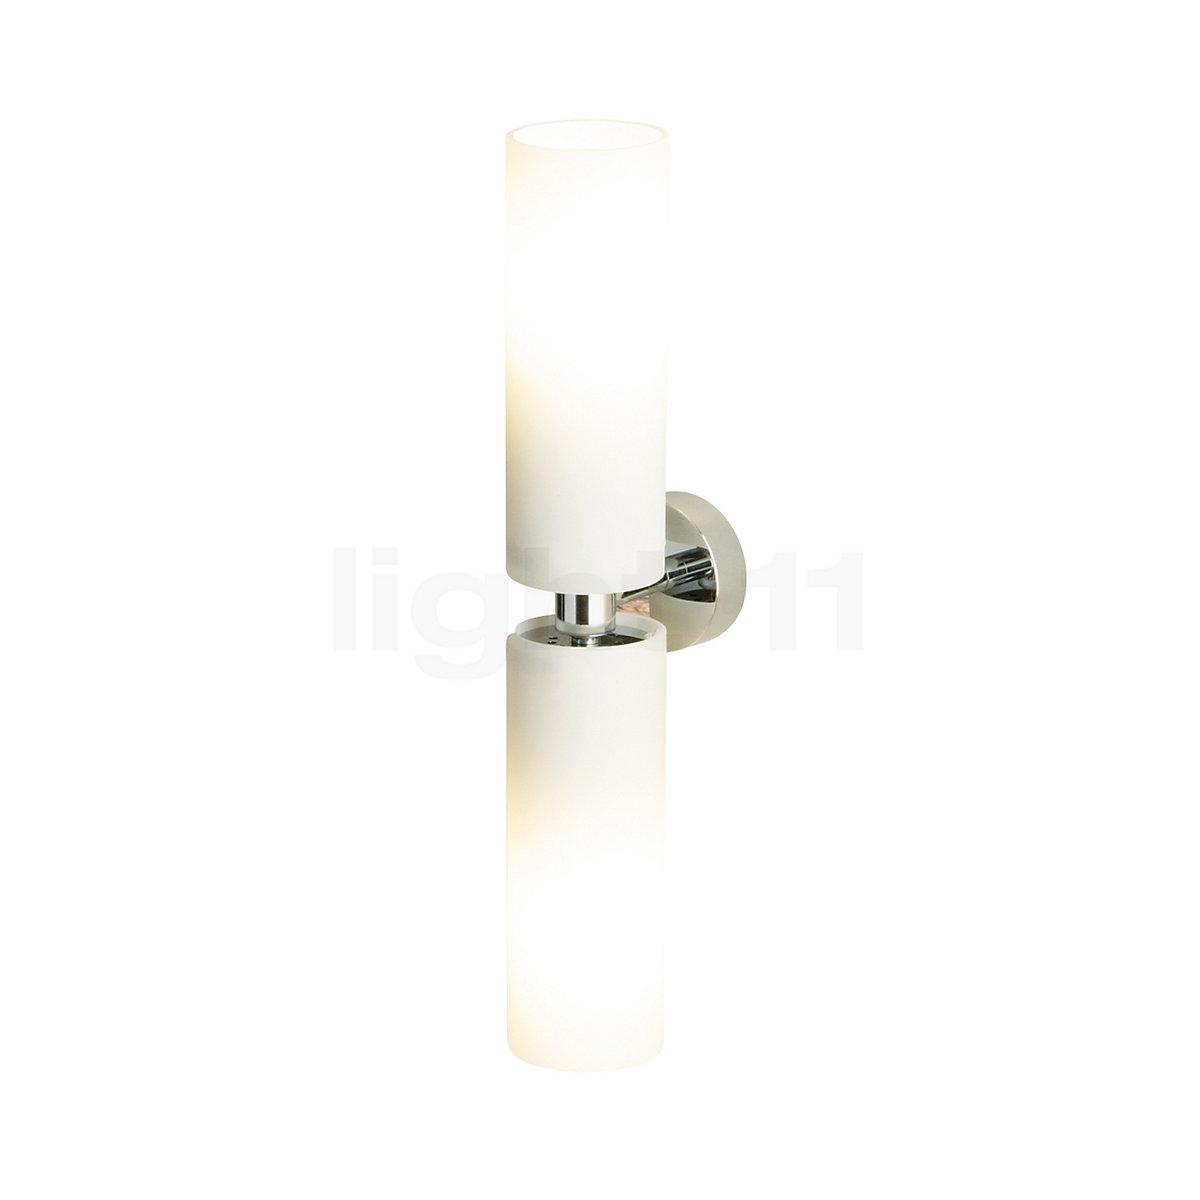 Buy Top Light Tube Wall Light 2 Lamps At Light11 Eu